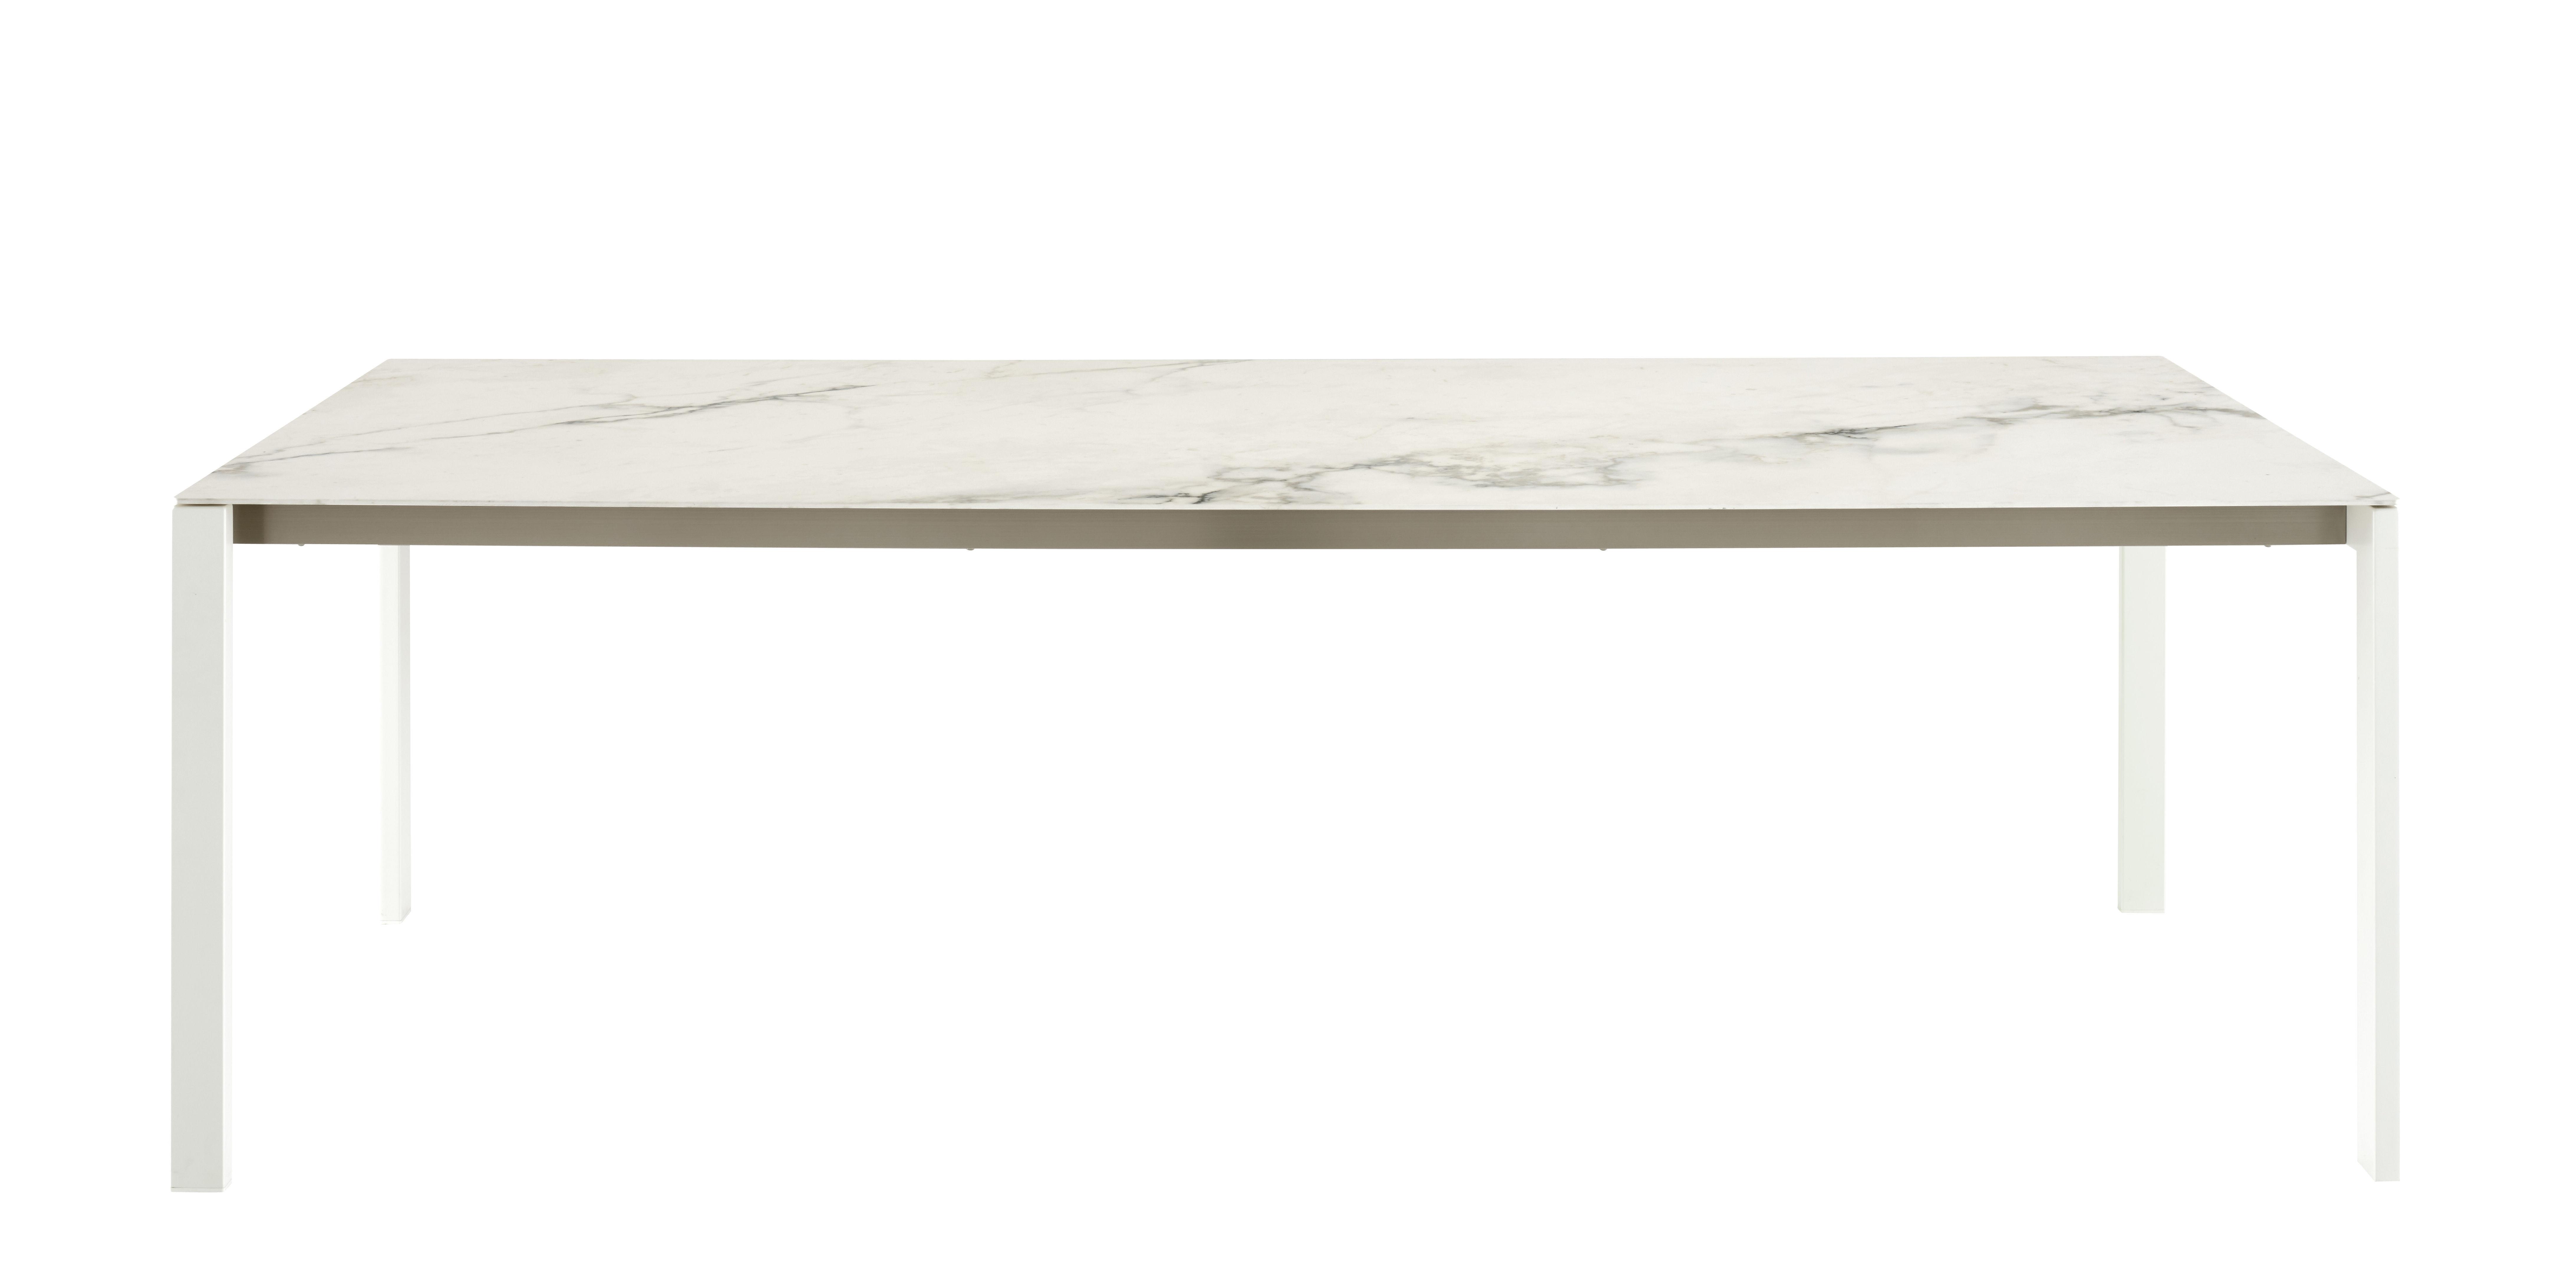 Outdoor - Tables de jardin - Table rectangulaire Dehors / Effet marbre - 240 x 100 cm - Cinna - Blanc - Acier inox laqué, Grès cérame effet marbre